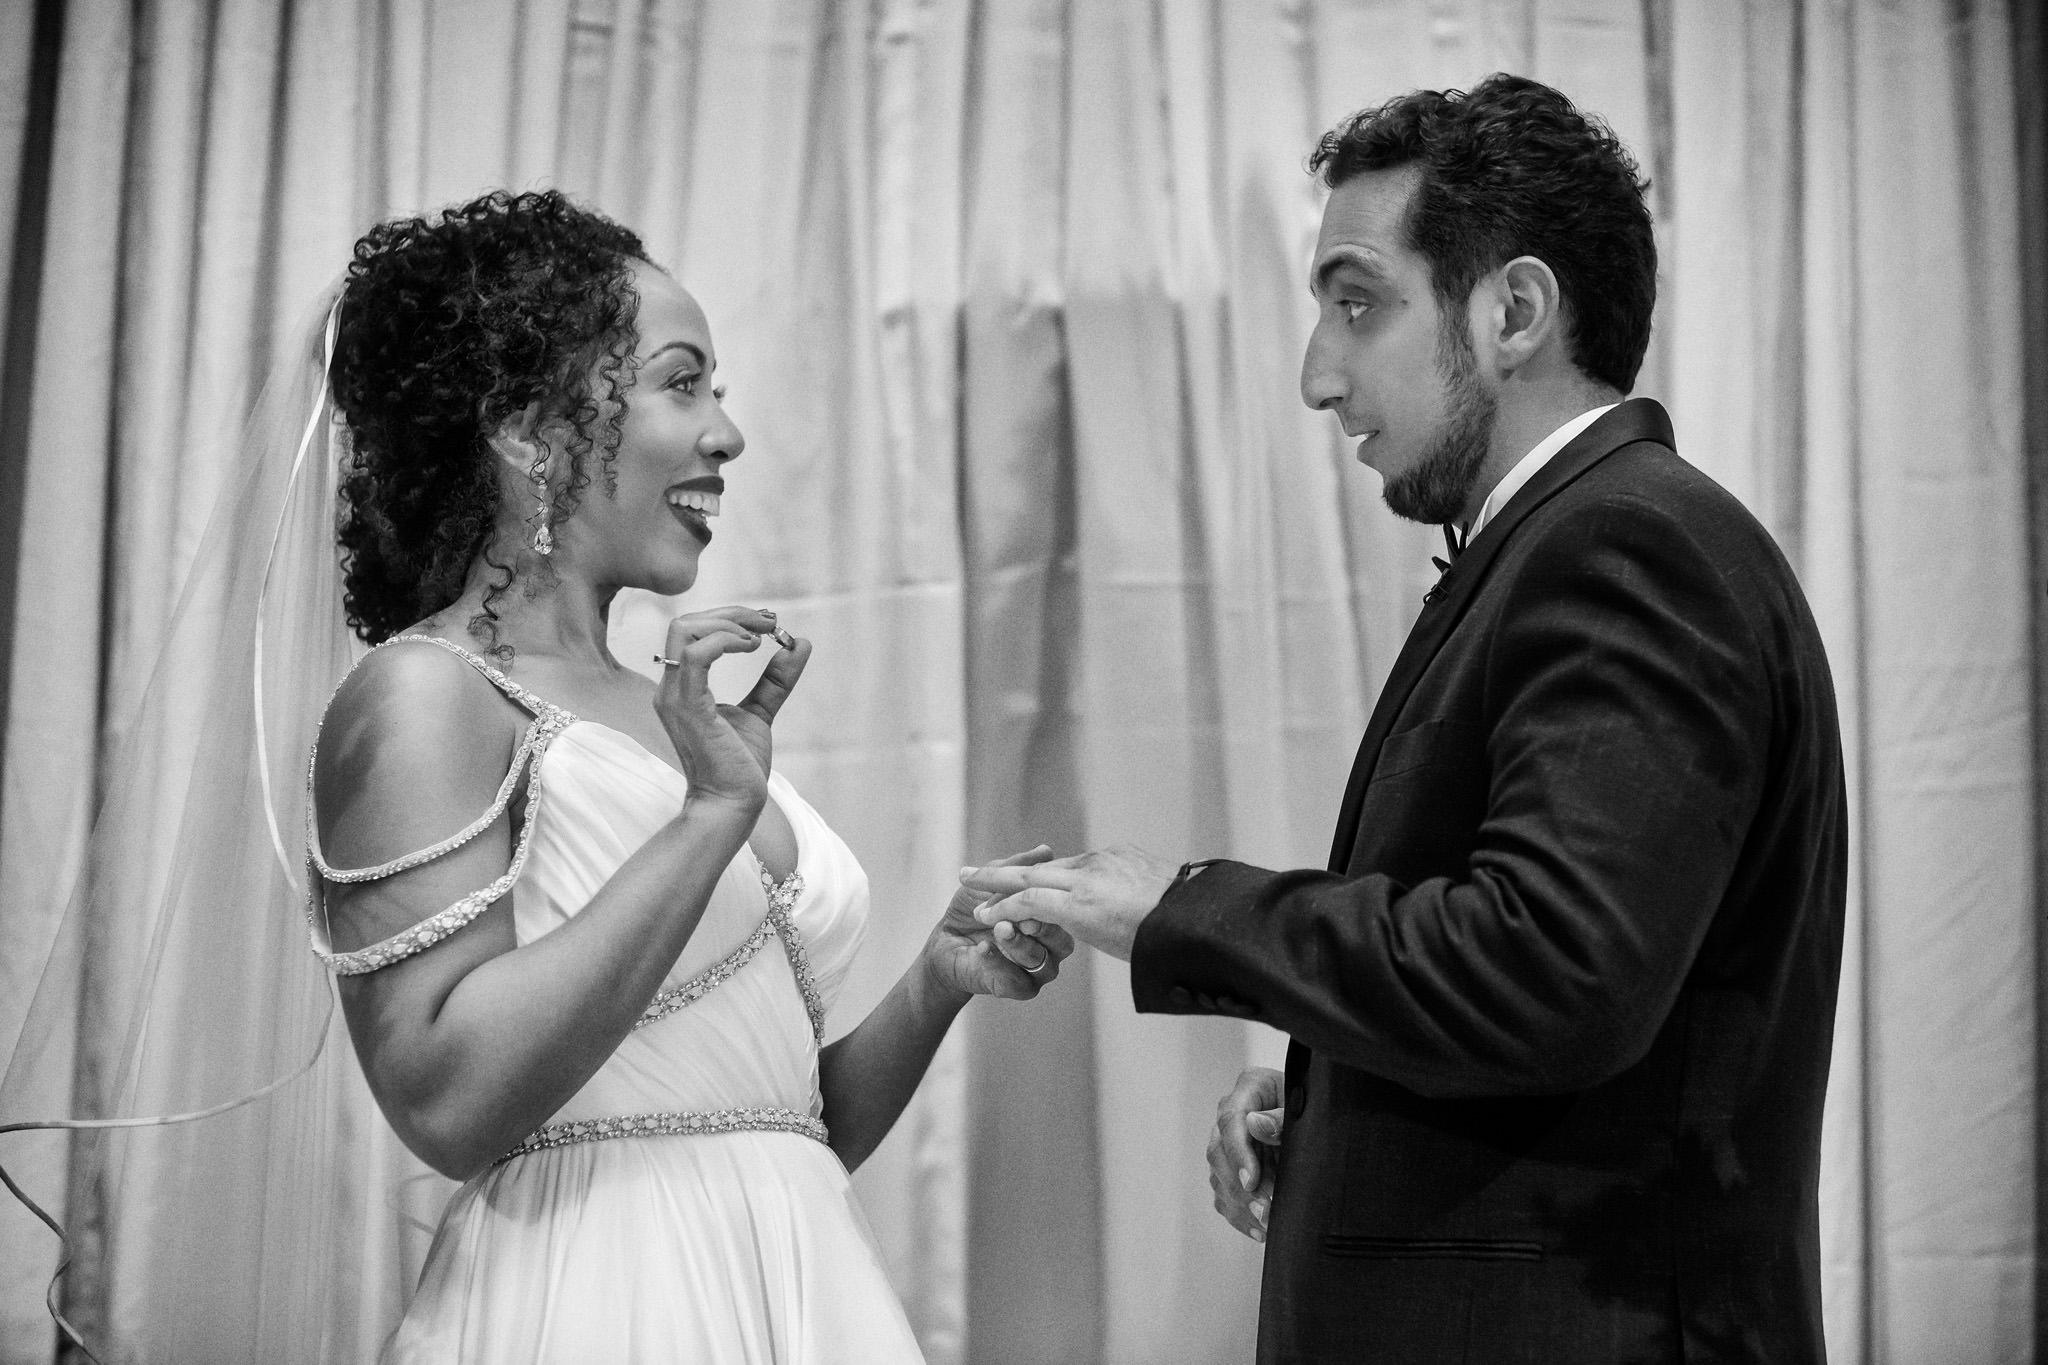 Bride and bridegroom exchange wedding rings at wedding ceremony at the San Francisco Design Center in San Francisco